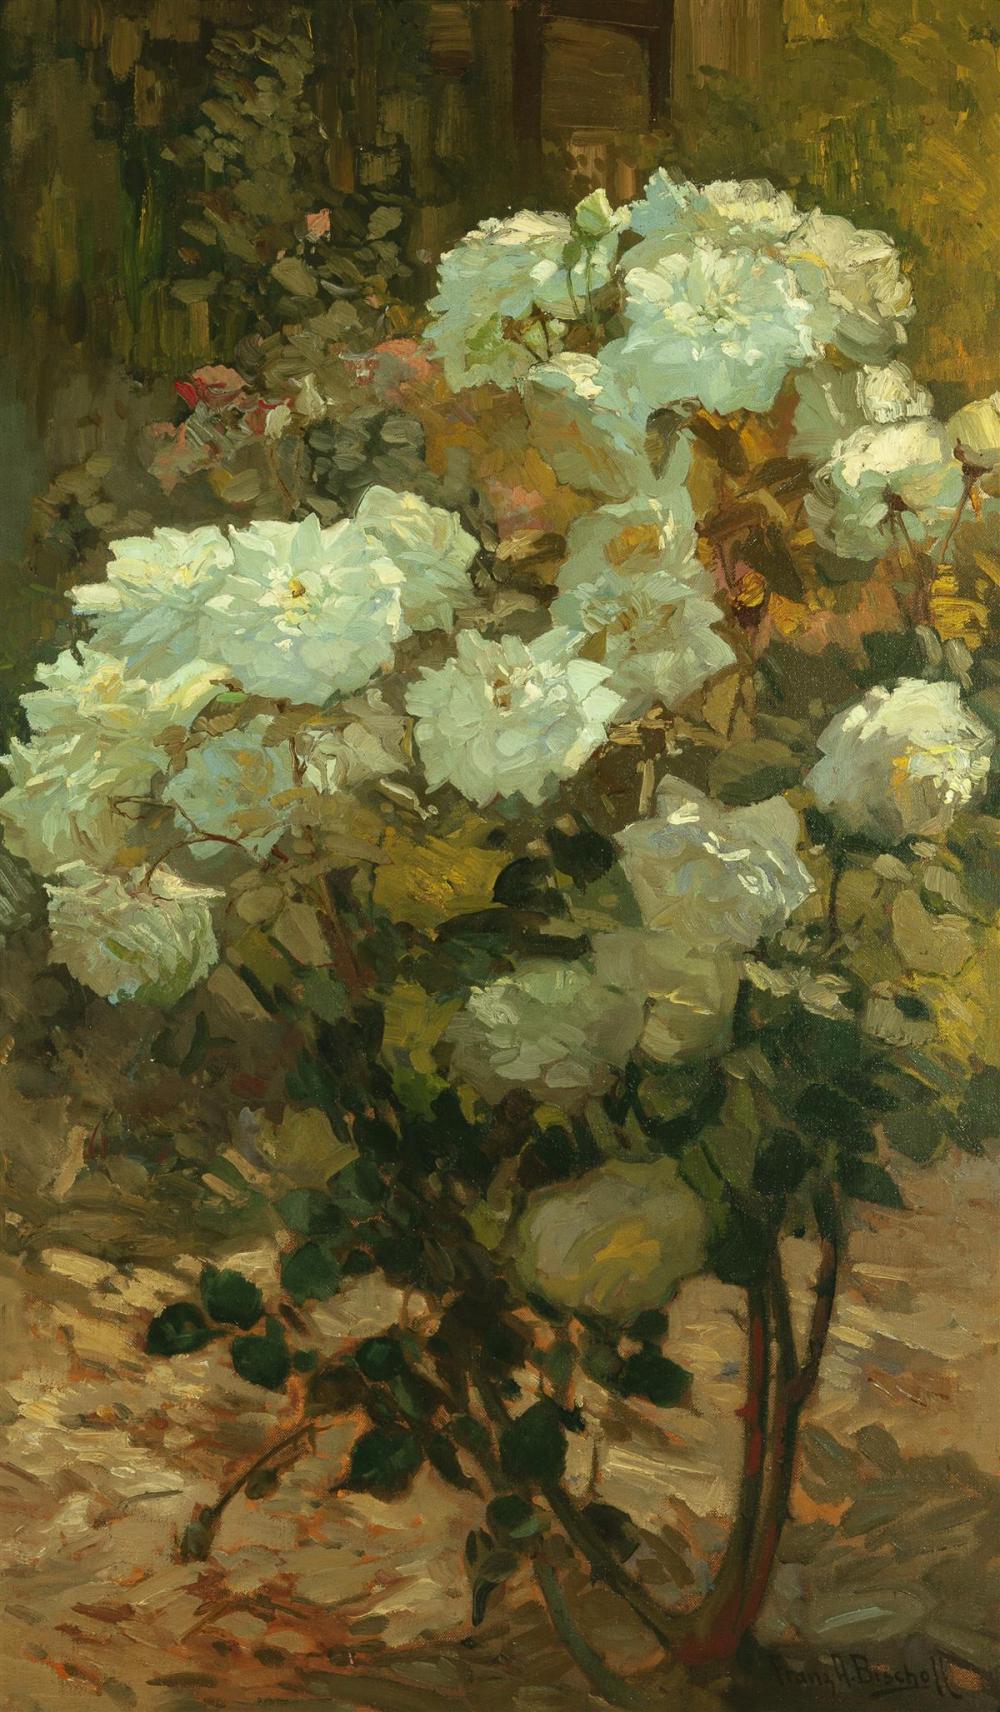 Franz A. Bischoff, (1864-1929 Pasadena, CA)